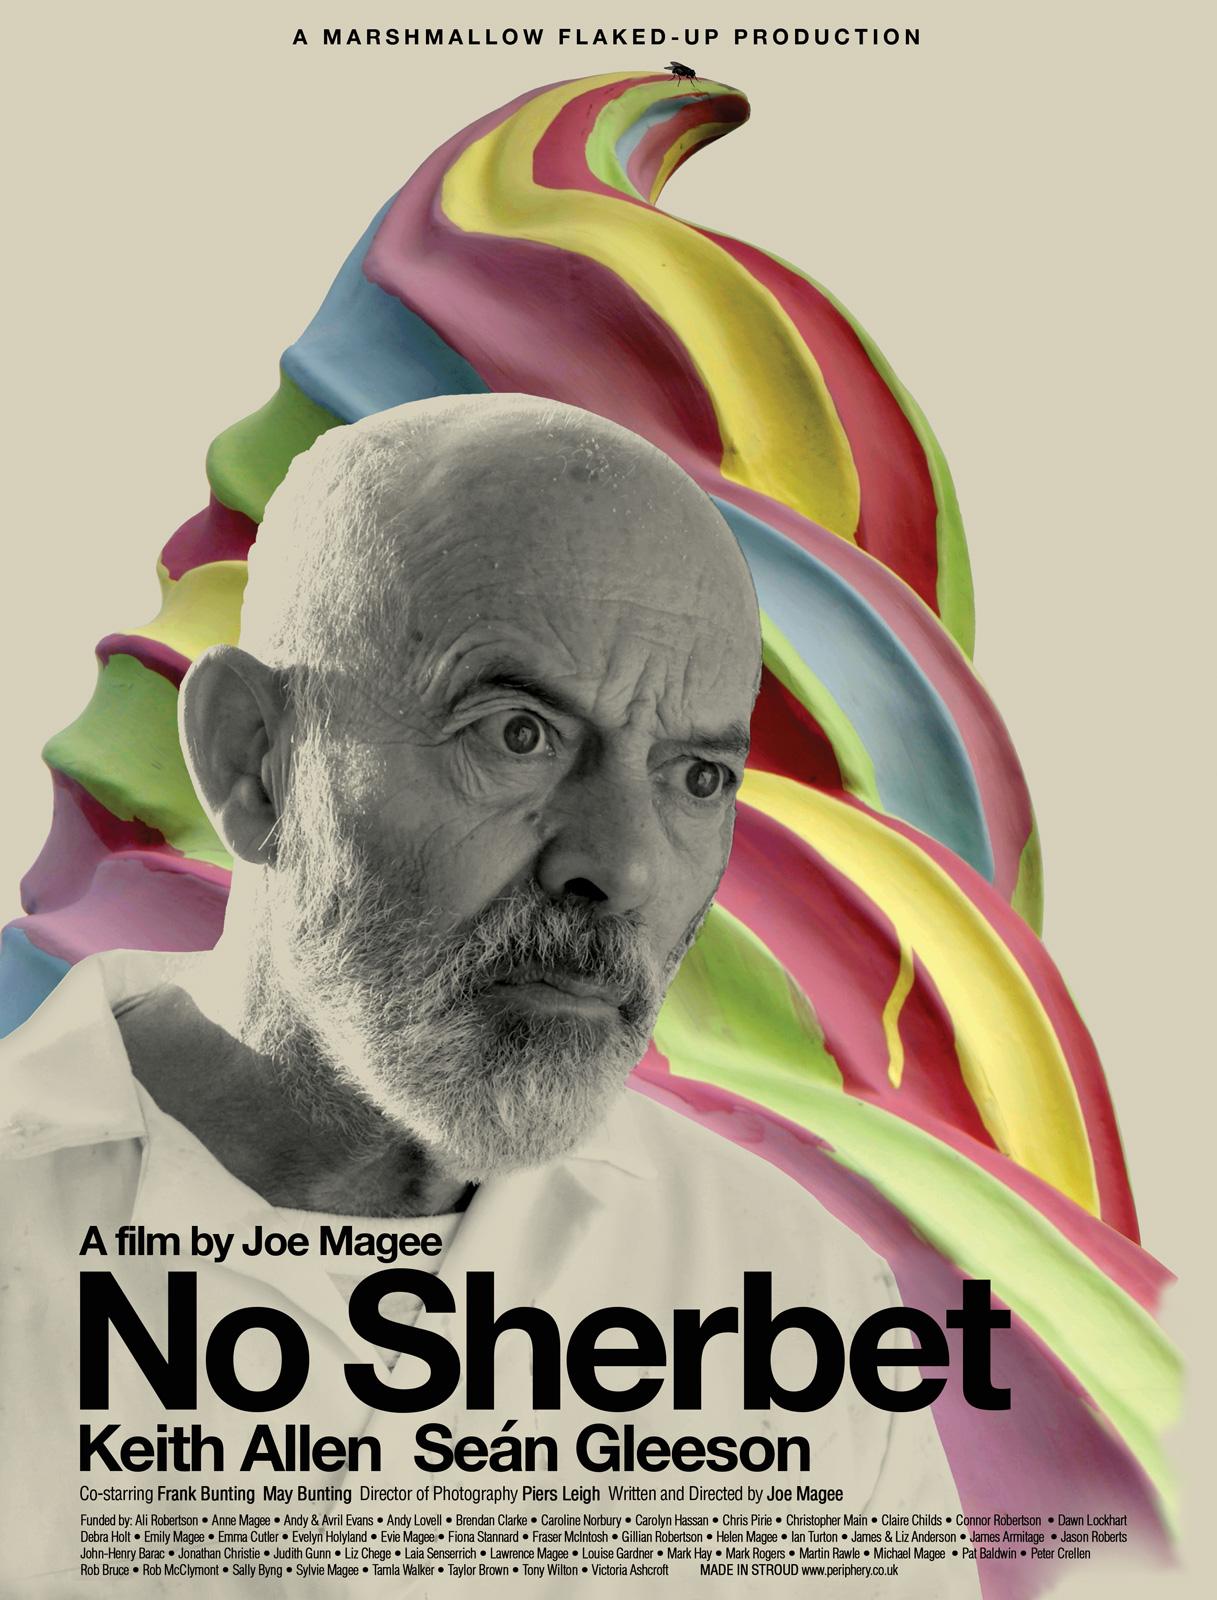 joemagee-No-Sherbet-Poster.jpg